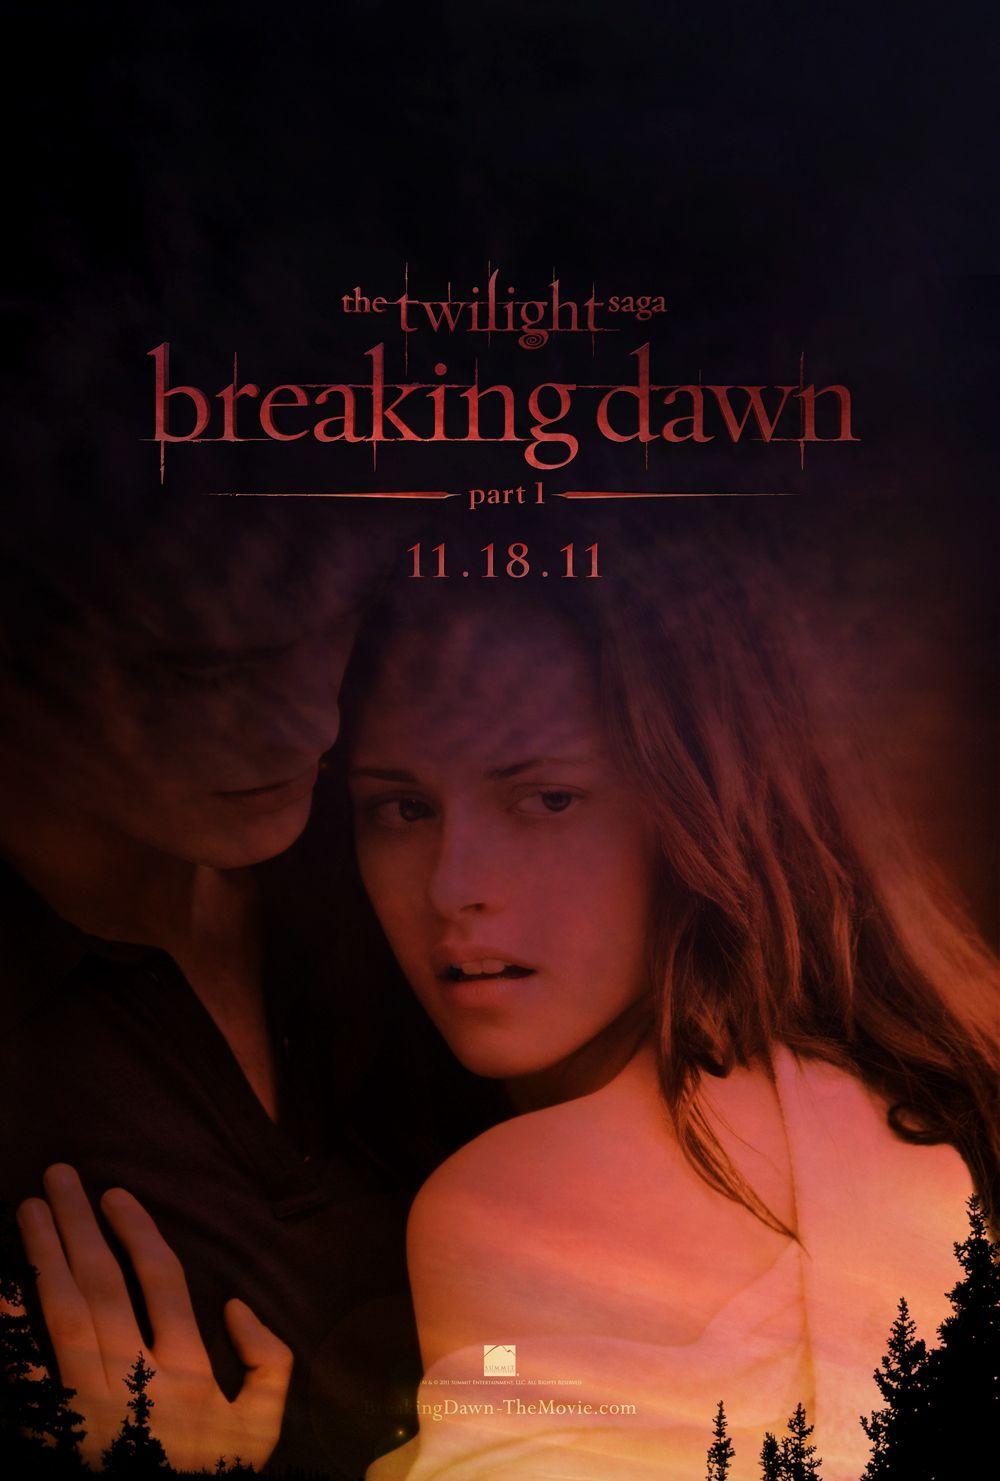 Twilight saga breaking dawn part 2 full movie download